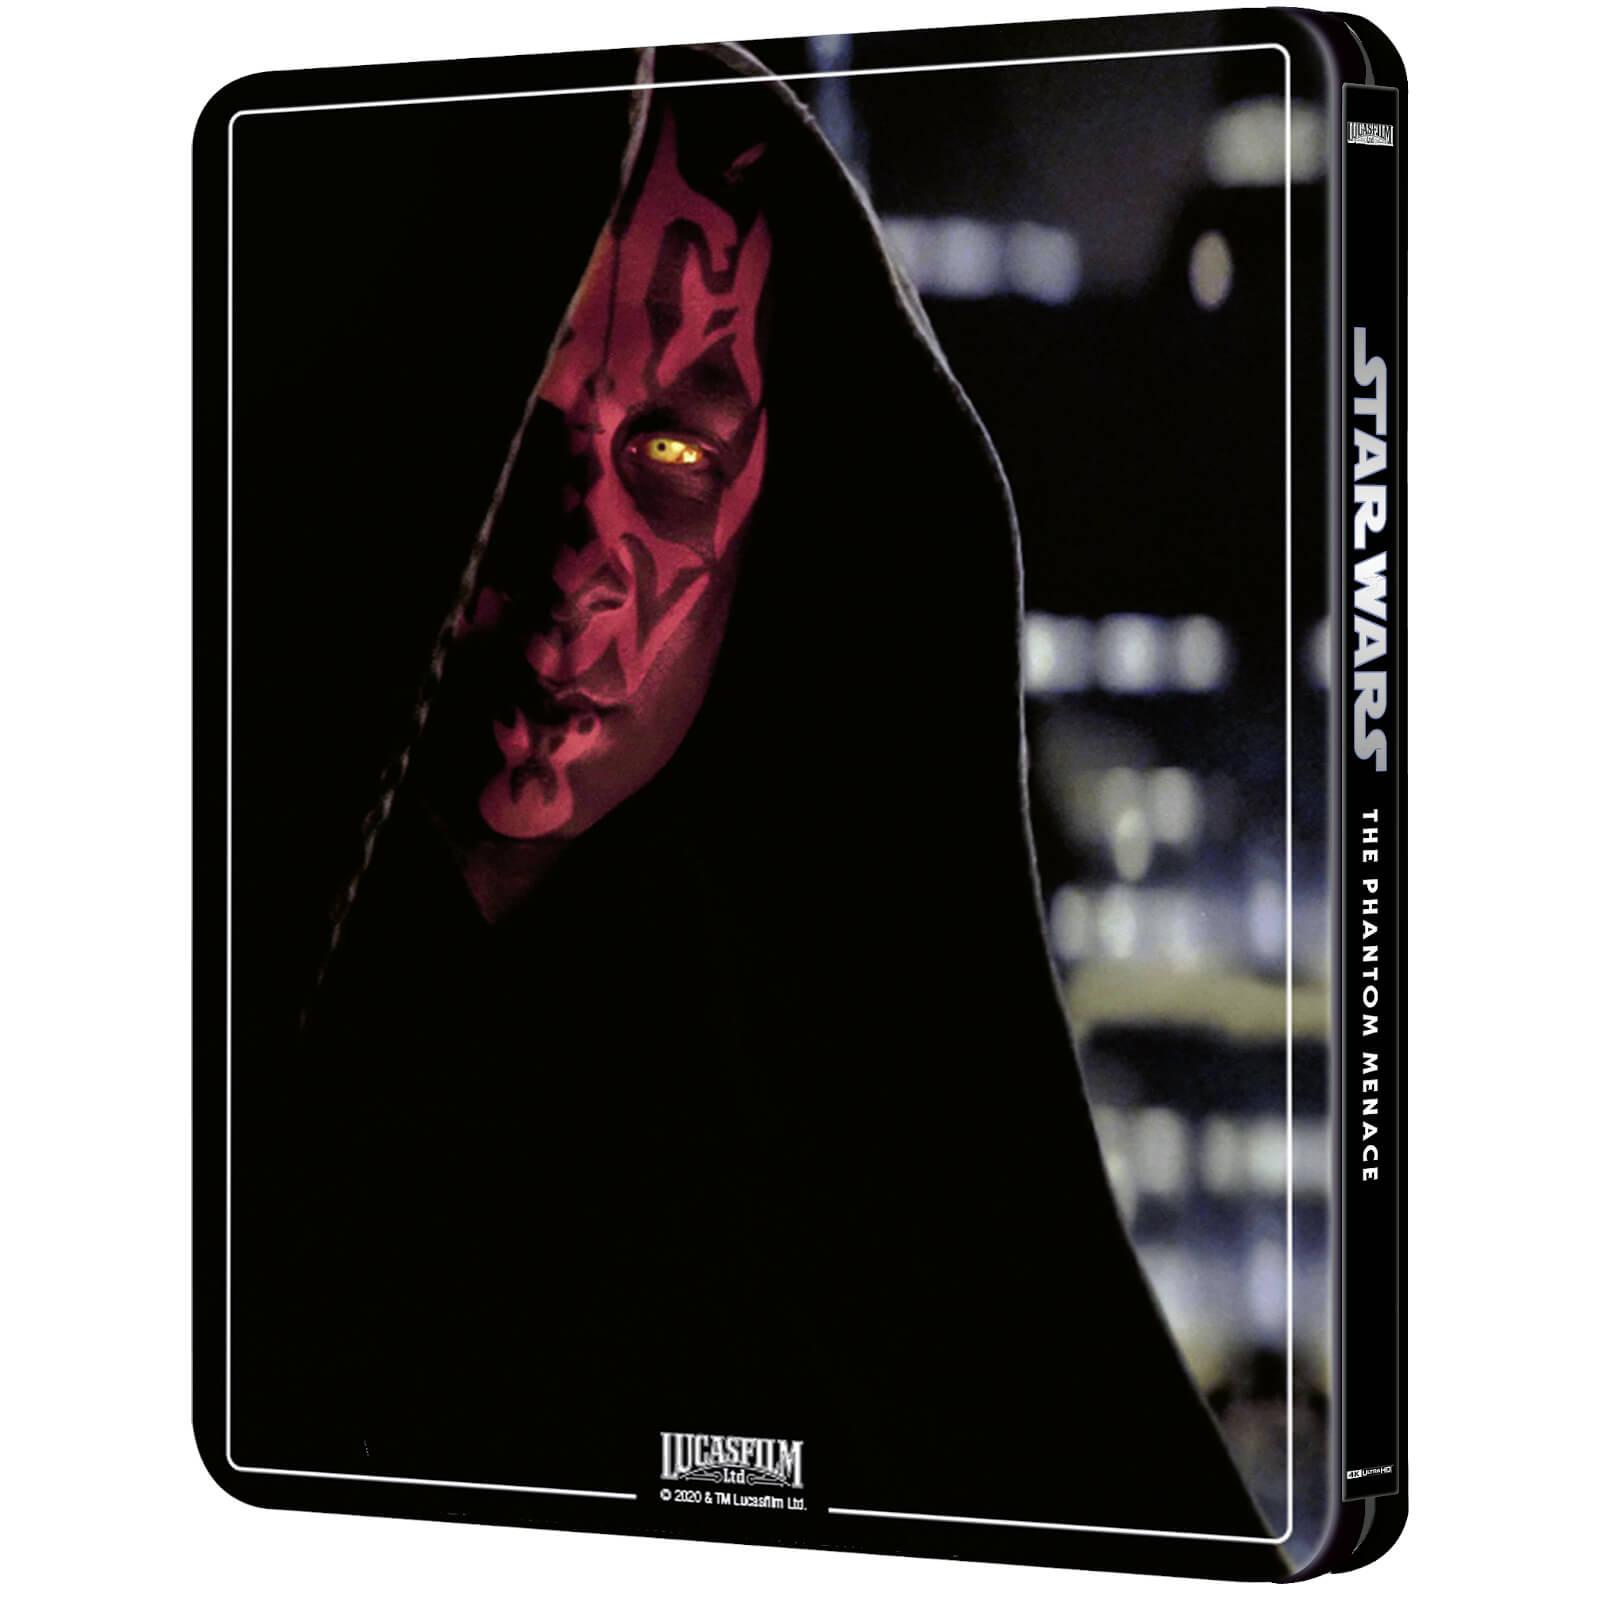 Star Wars: Episode I - The Phantom Menace (4K+2D Blu-ray SteelBook) Zavvi Star-Wars-The-Phantom-Menace-steelbook-4K-2